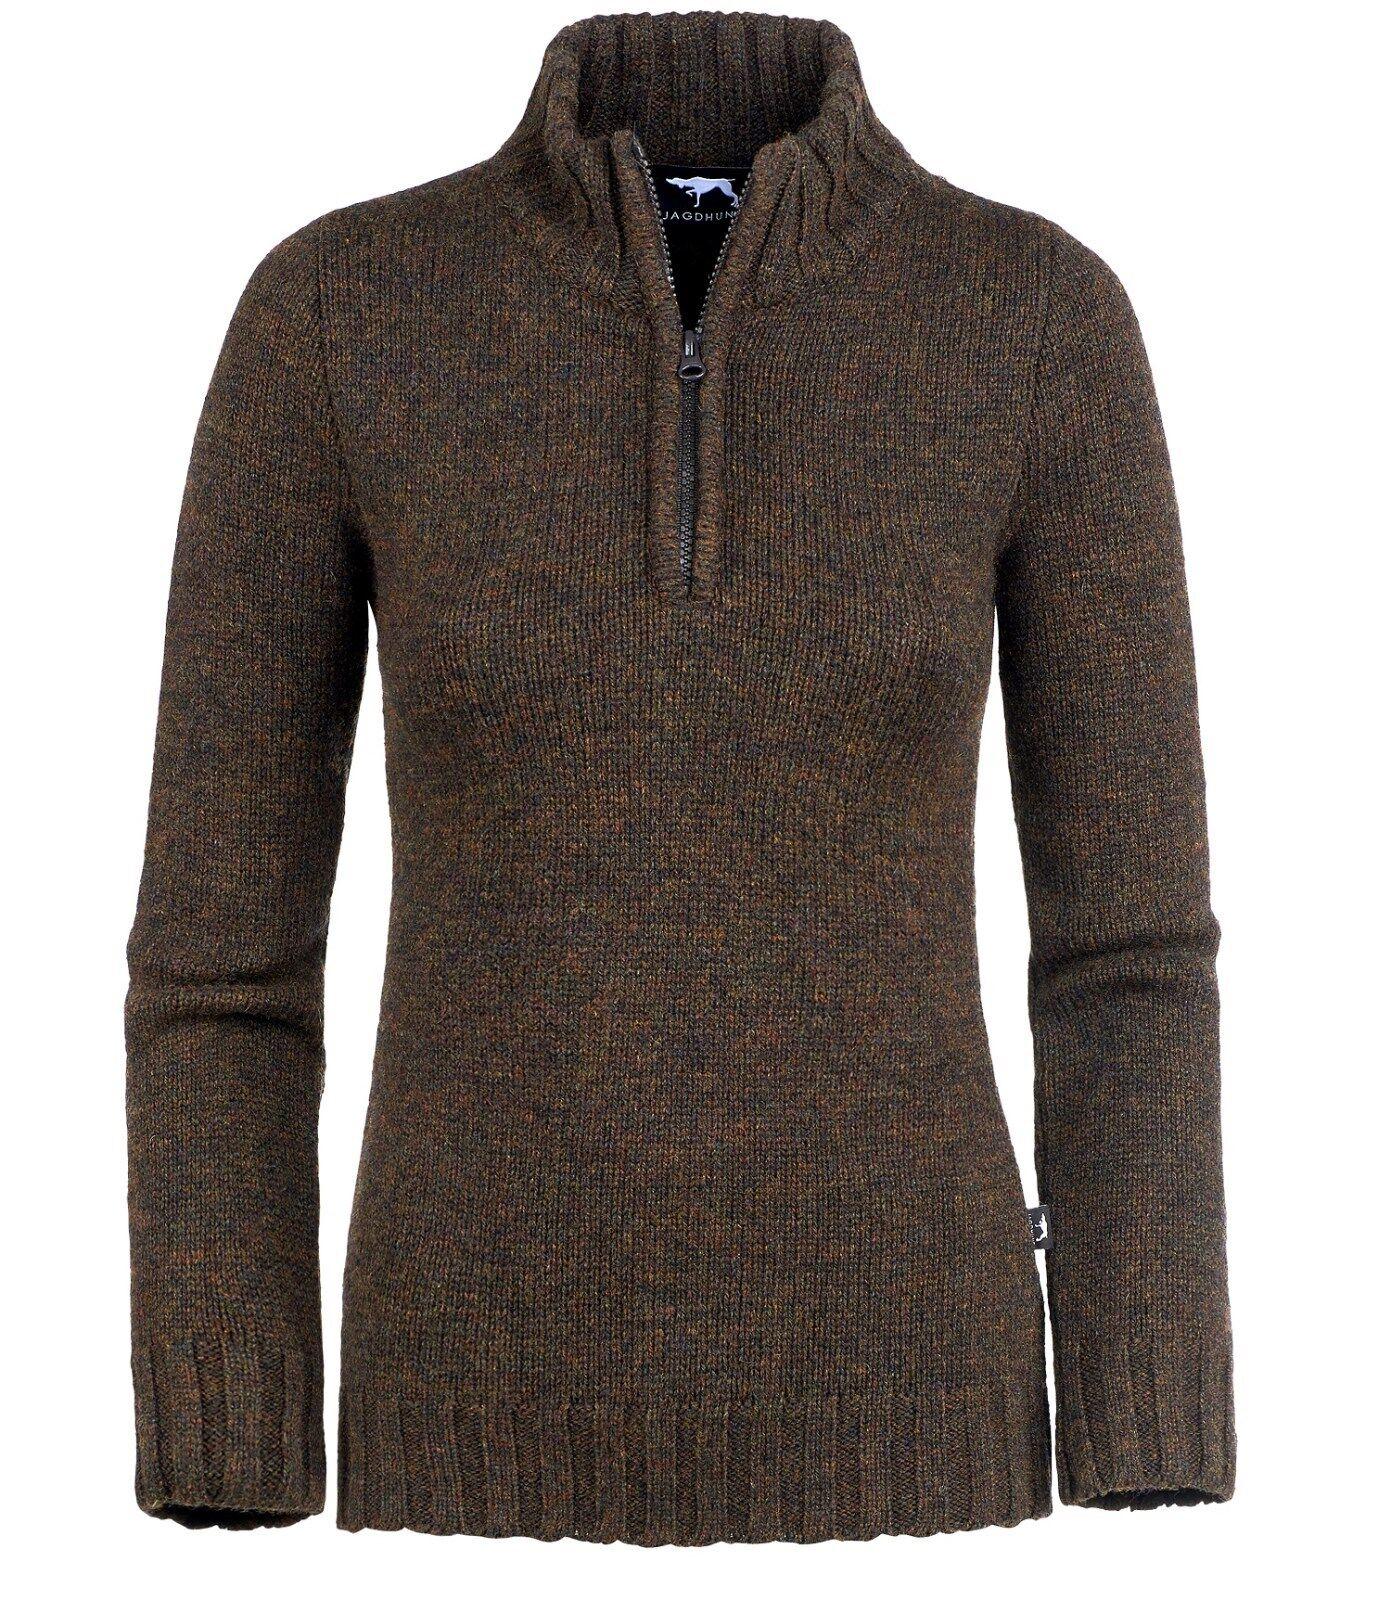 NEU     JAGDHUND Damen-Wollpullover Damen-Wollpullover Damen-Wollpullover BRIXEN - braun  - B1536 5b9e4b